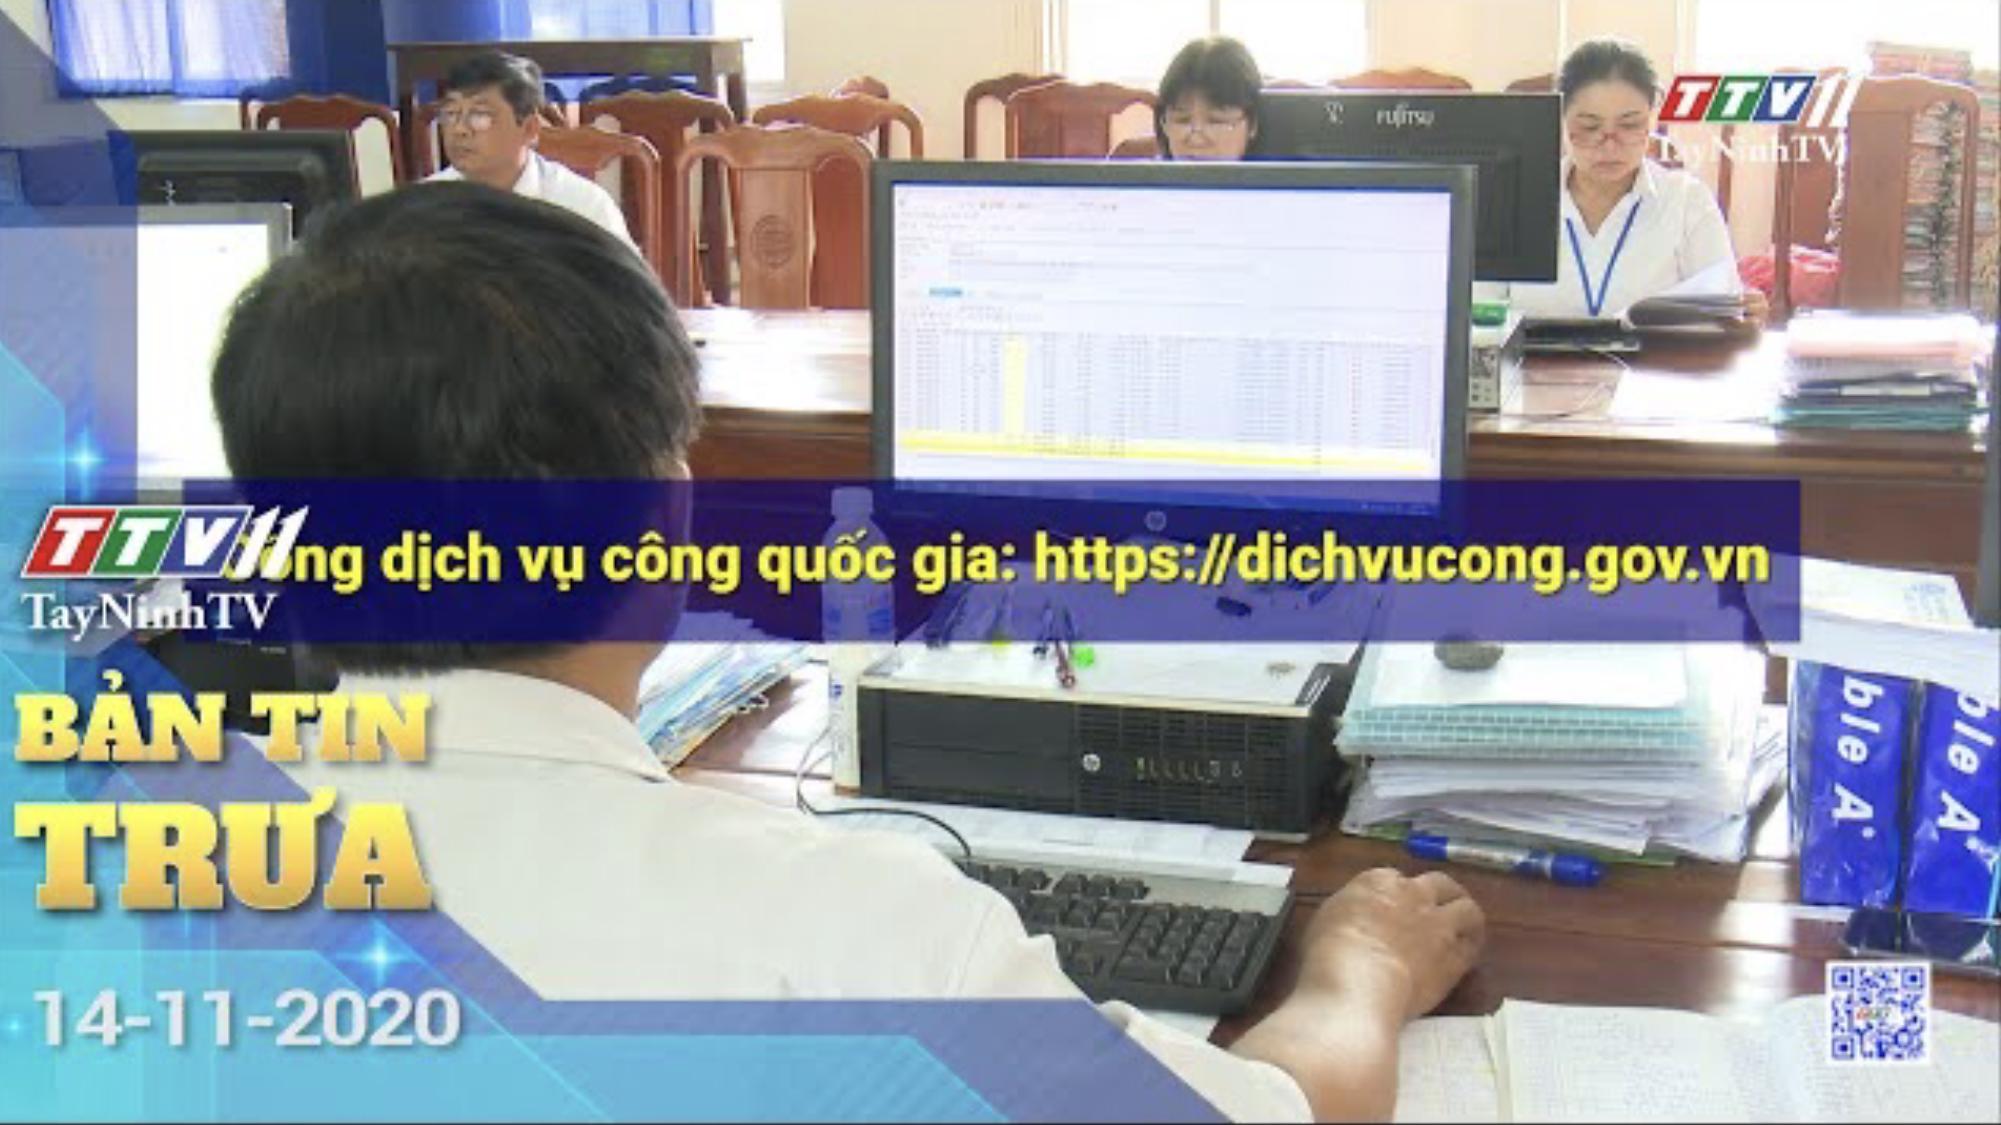 Bản tin trưa 14-11-2020 | Tin tức hôm nay | TayNinhTV